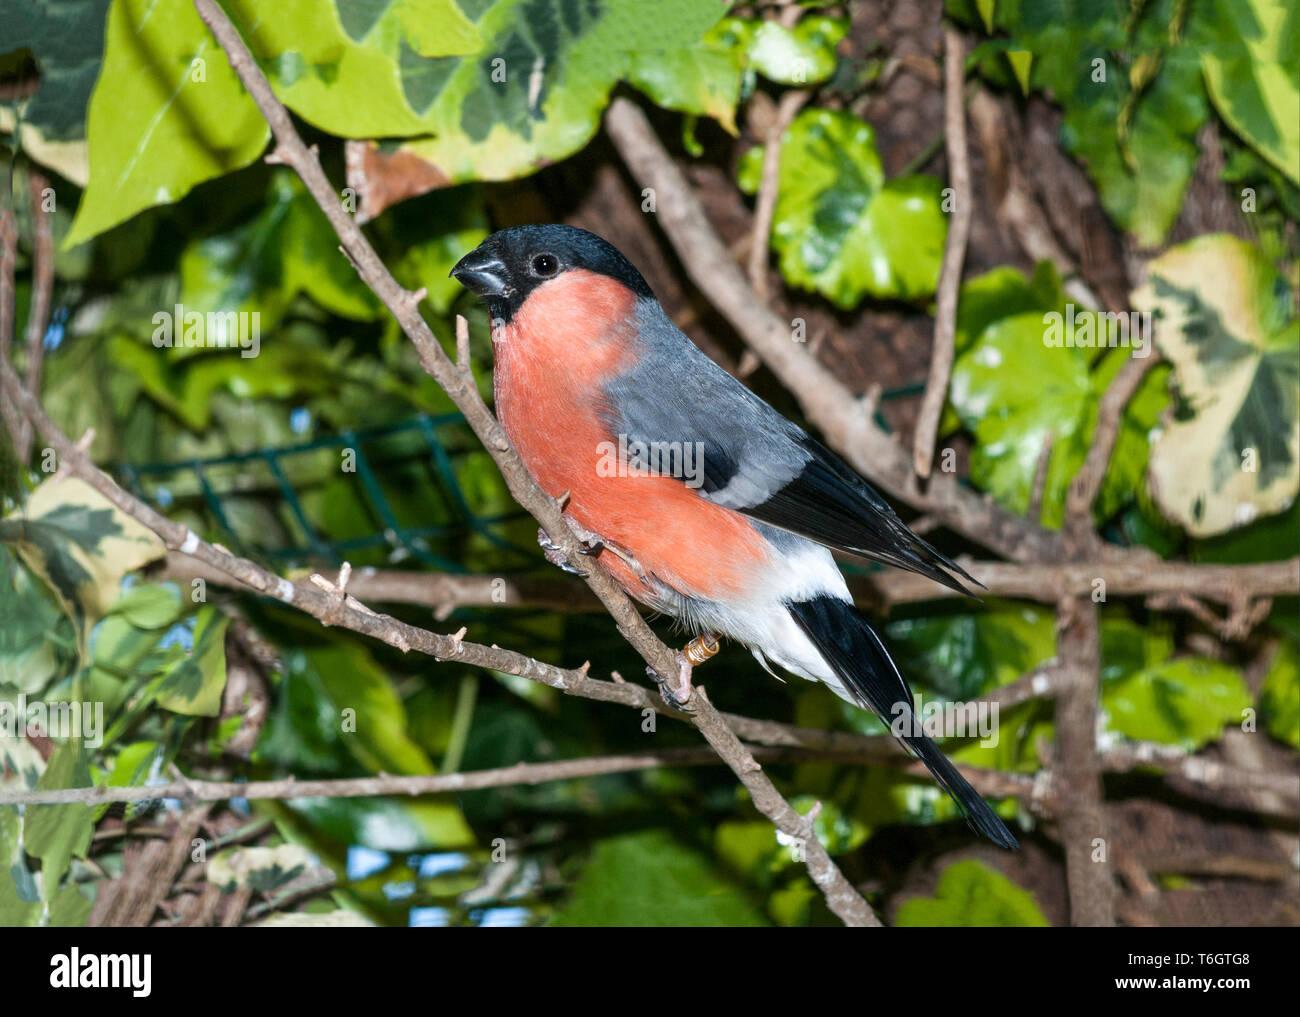 Bullfinch (Pyrrhula pyrrhula) - Stock Image